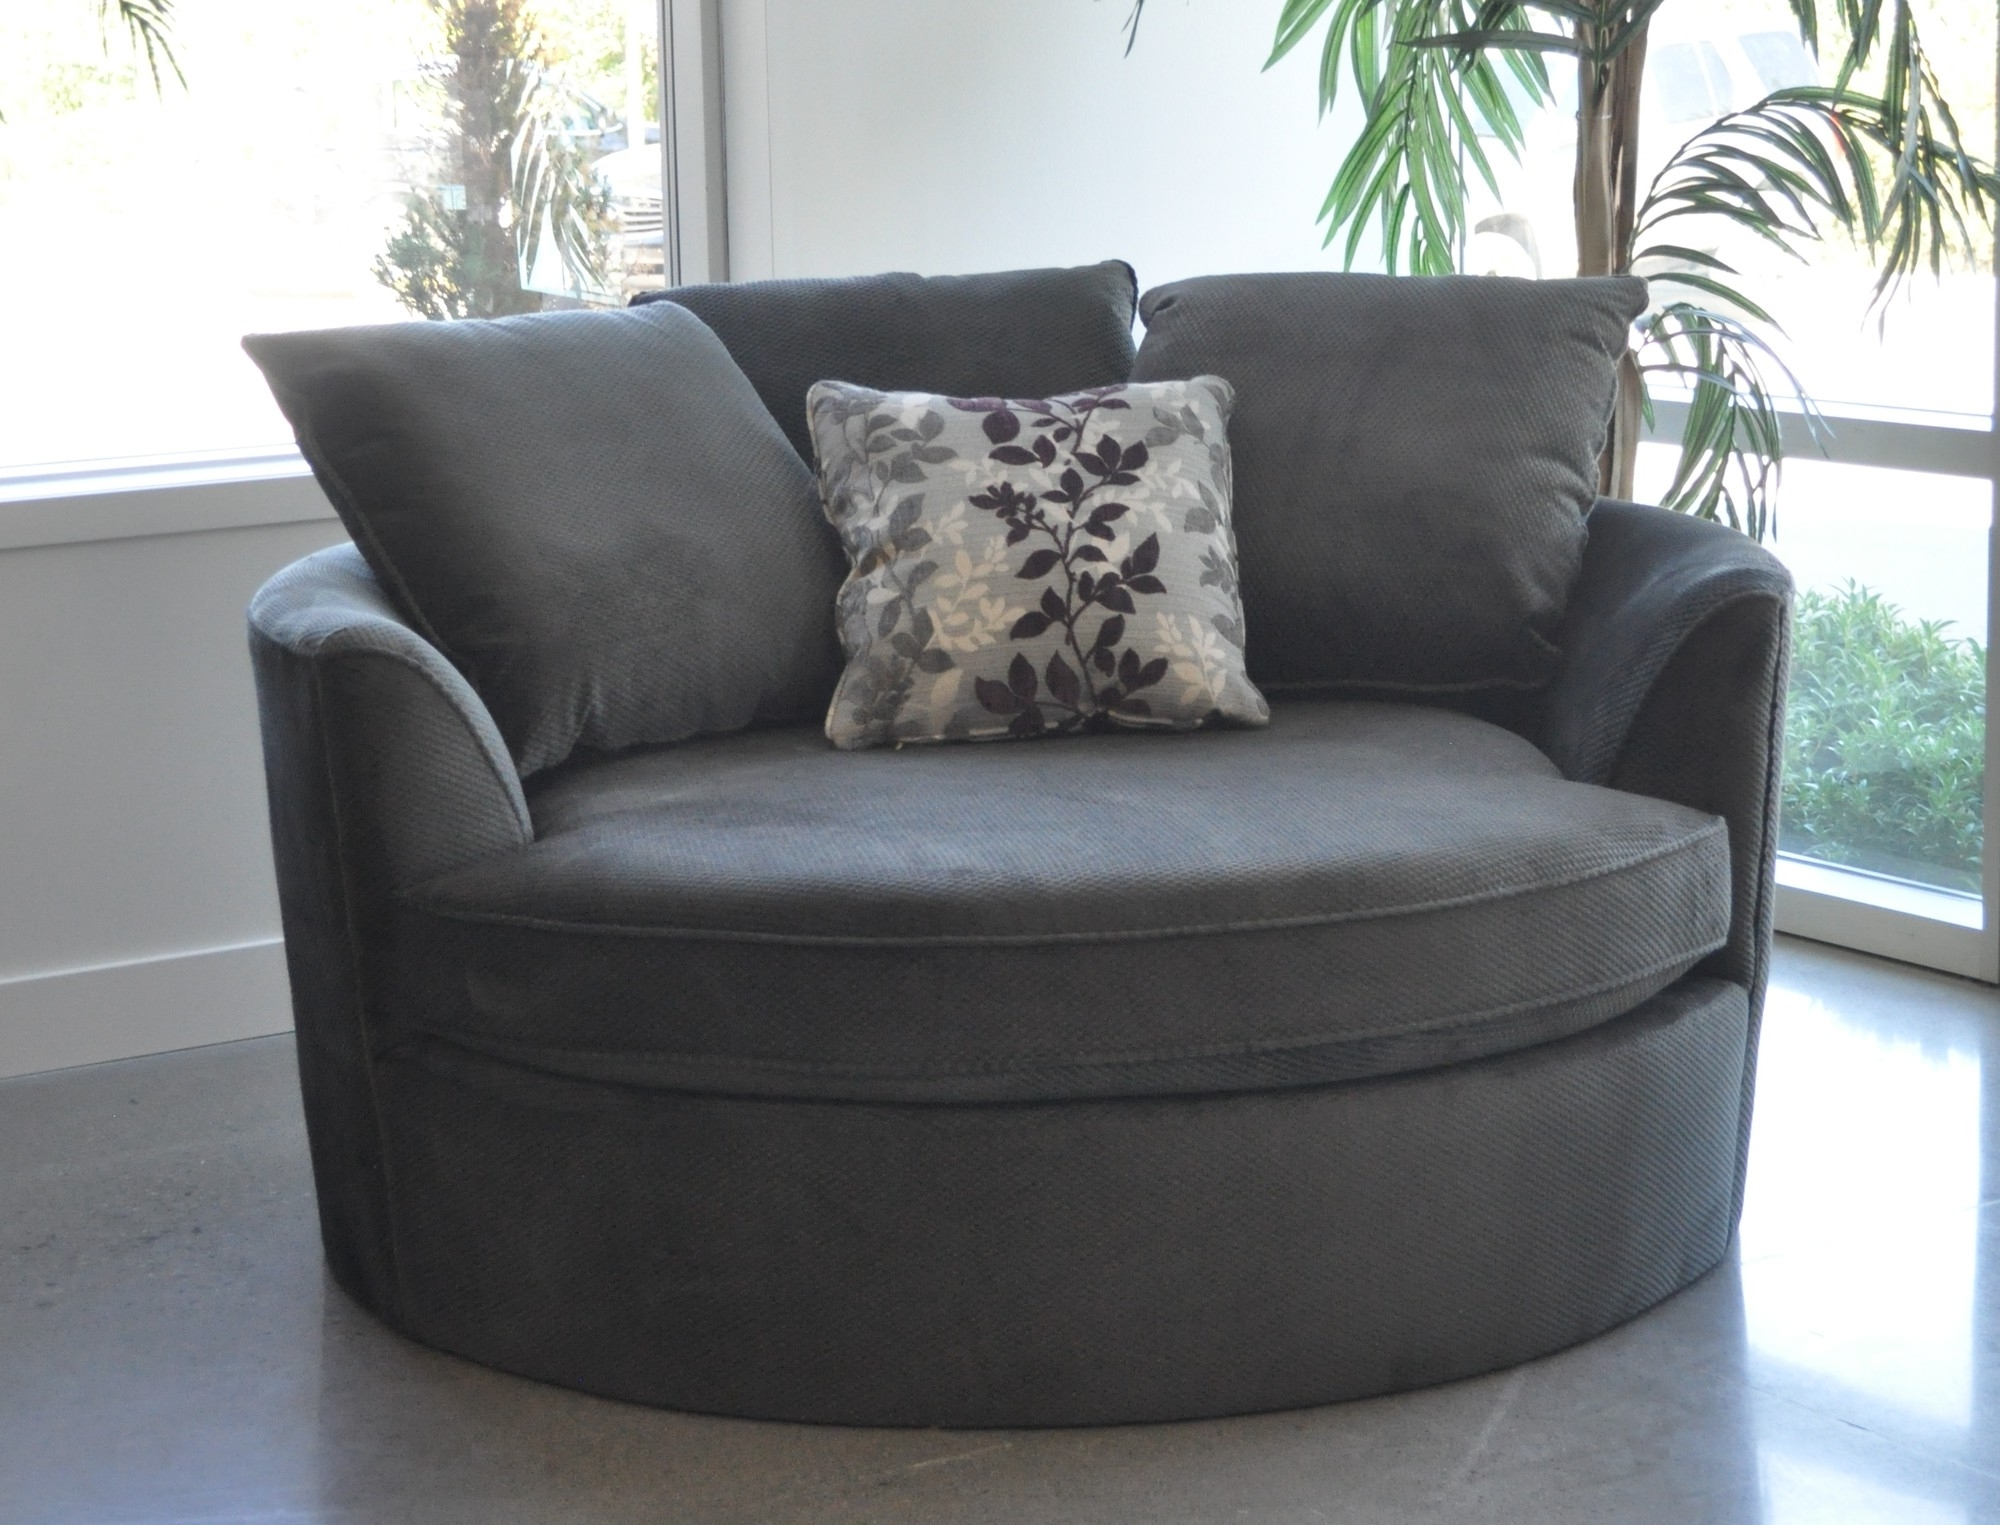 Preferred Sofa : Round Sofa Outdoor Furniture Round Sofa Chair Uk Large Inside Large Sofa Chairs (View 17 of 20)